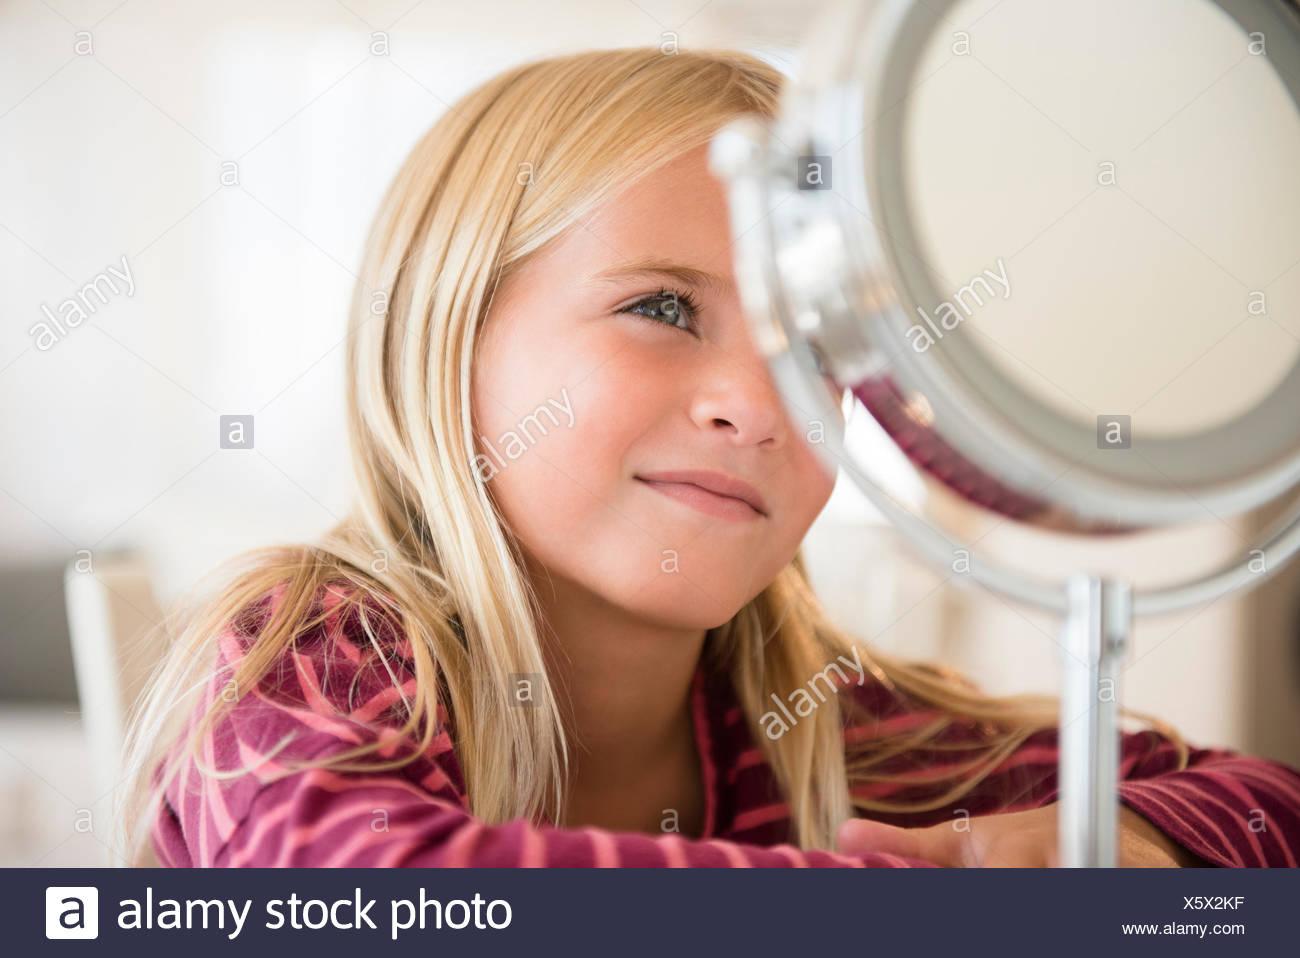 Girl (6-7) looking at vanity mirror - Stock Image